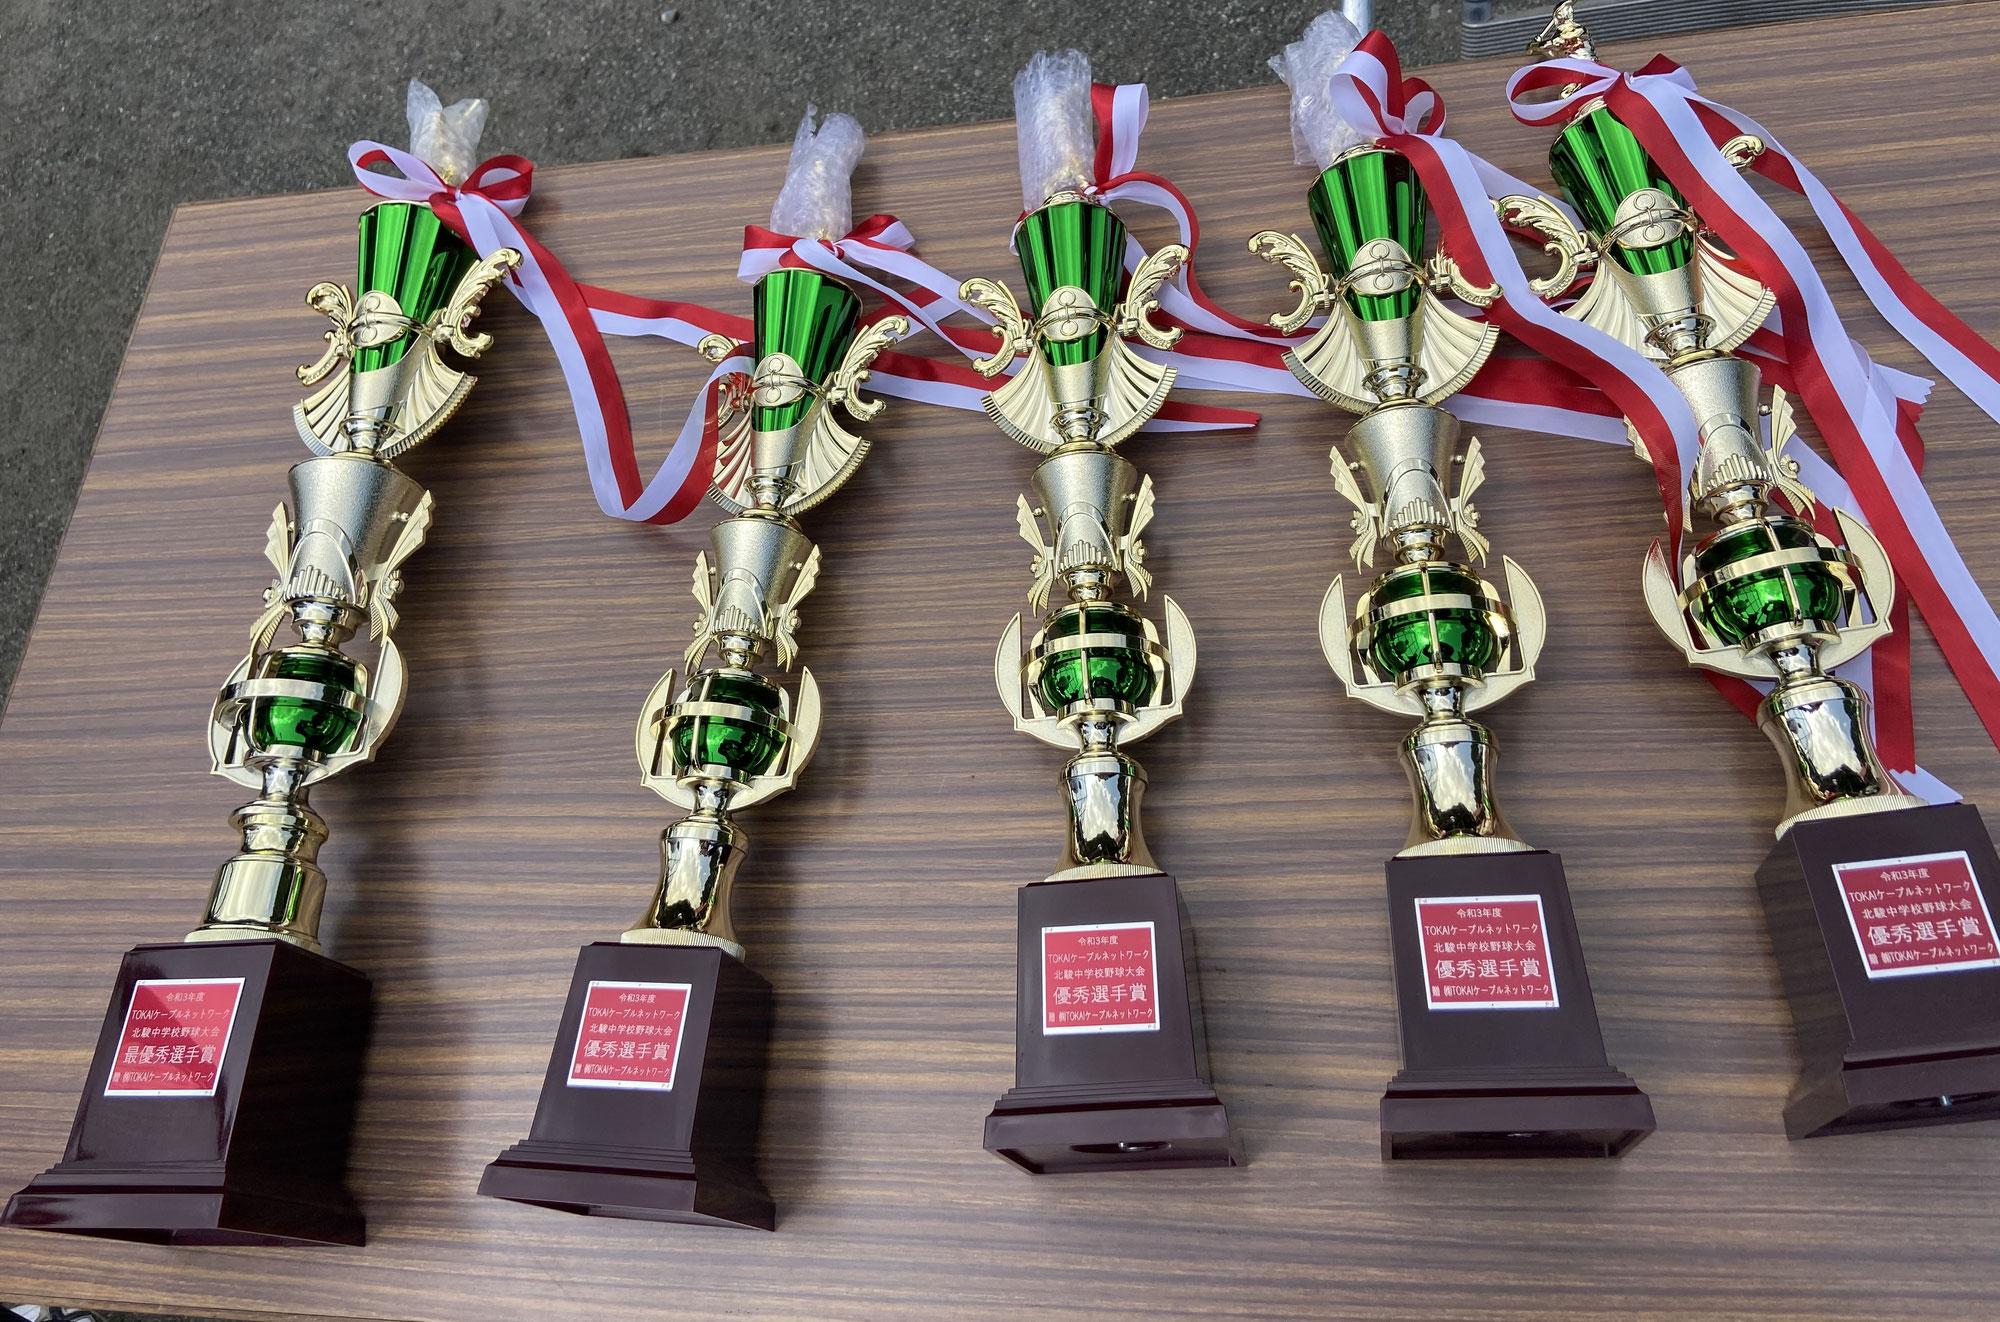 TOKAIケーブルネットワーク 北駿中学校野球大会 決勝戦の模様がケーブルTVで放映されます